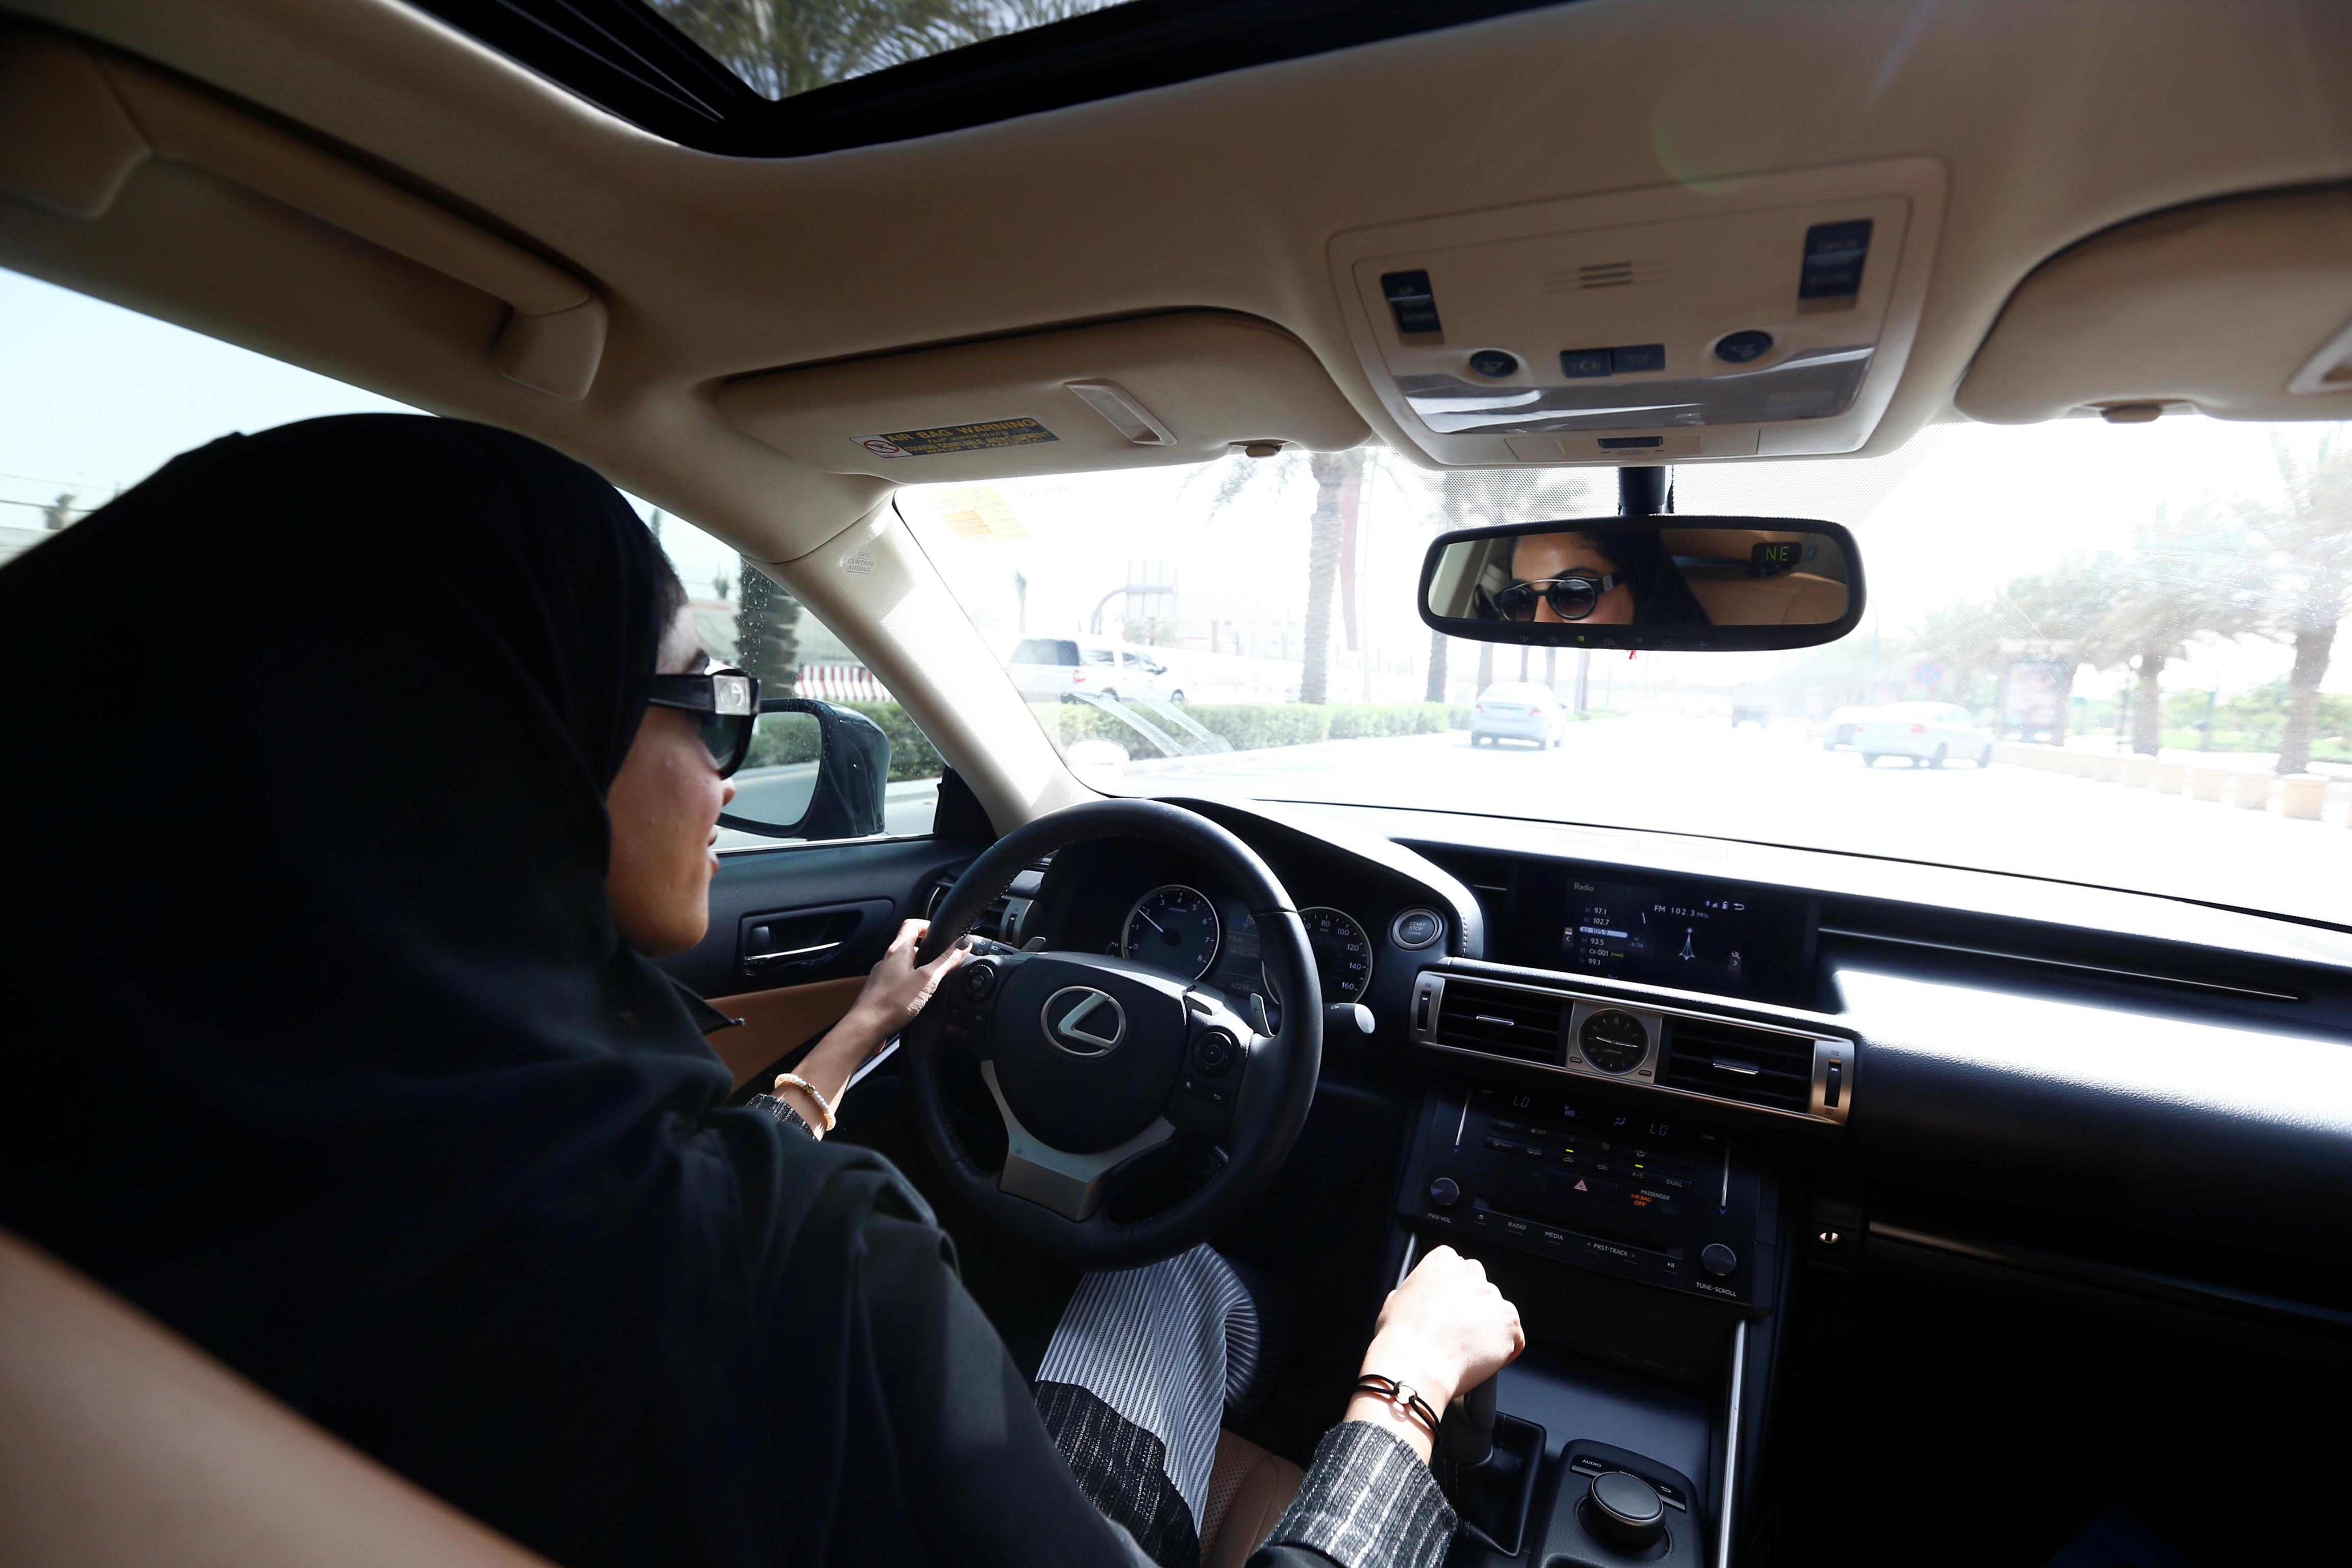 Gcc News Roundup Saudi Arabias Driving Ban Ends Yemens Warring Parties Agree To Resume Negotiations June